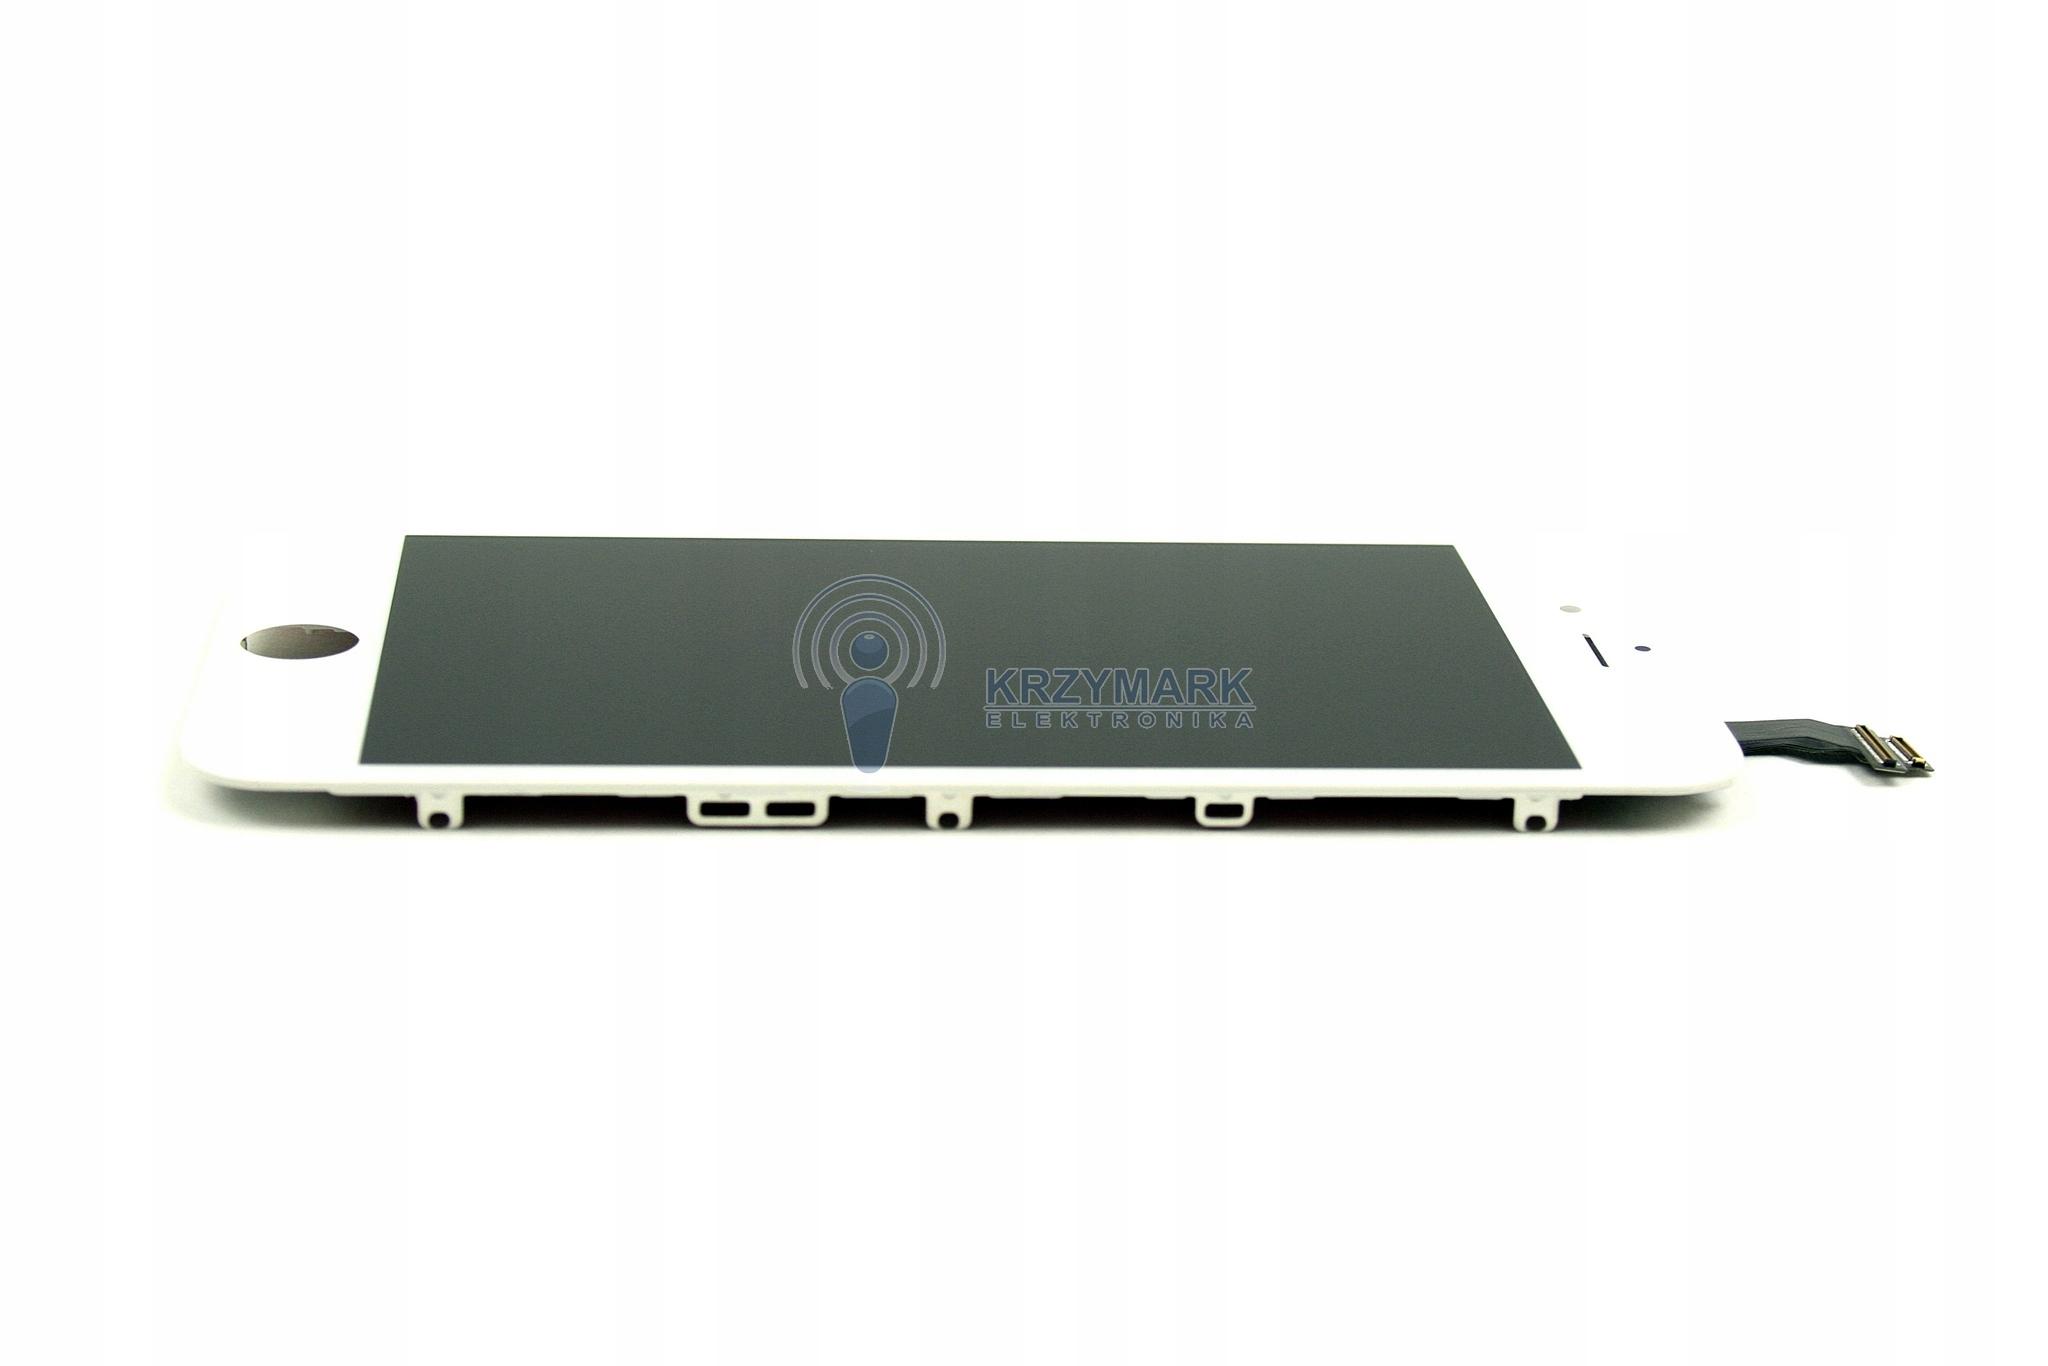 IPHONE WYŚWIETLACZ 6 EKRAN DOTYK LCD A1549 RAMKA